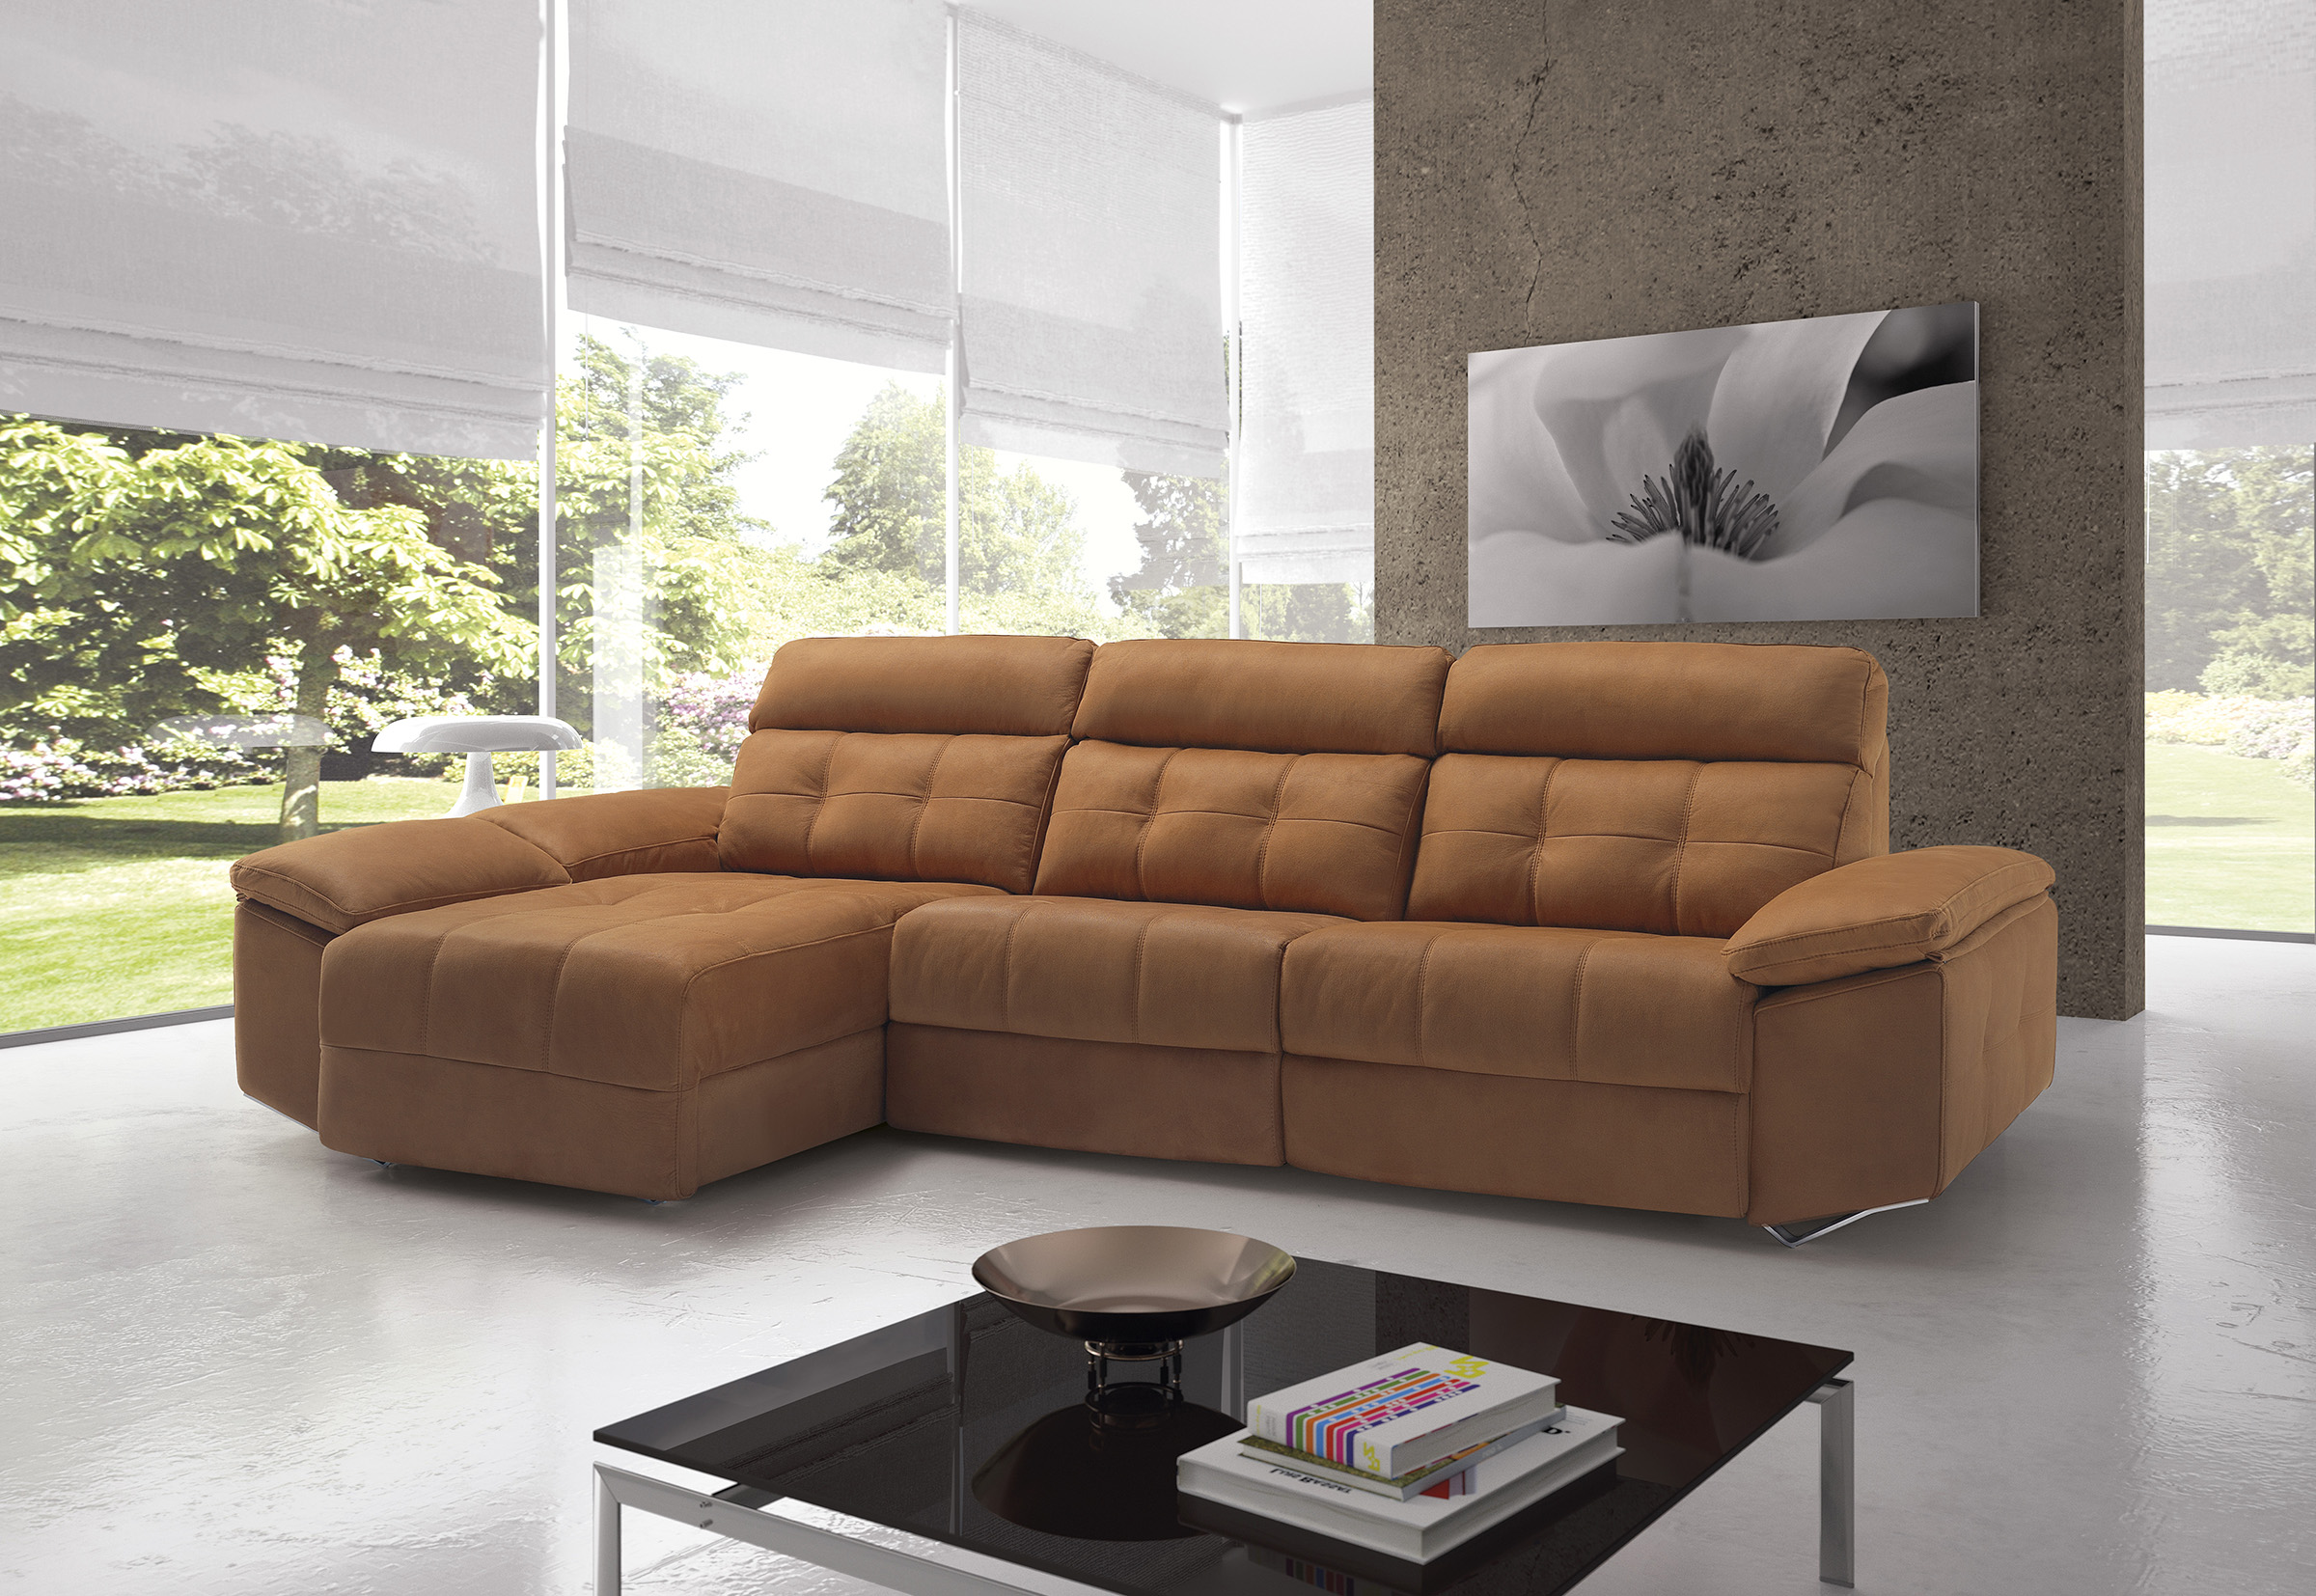 Sofas - Mobiliario Lozano